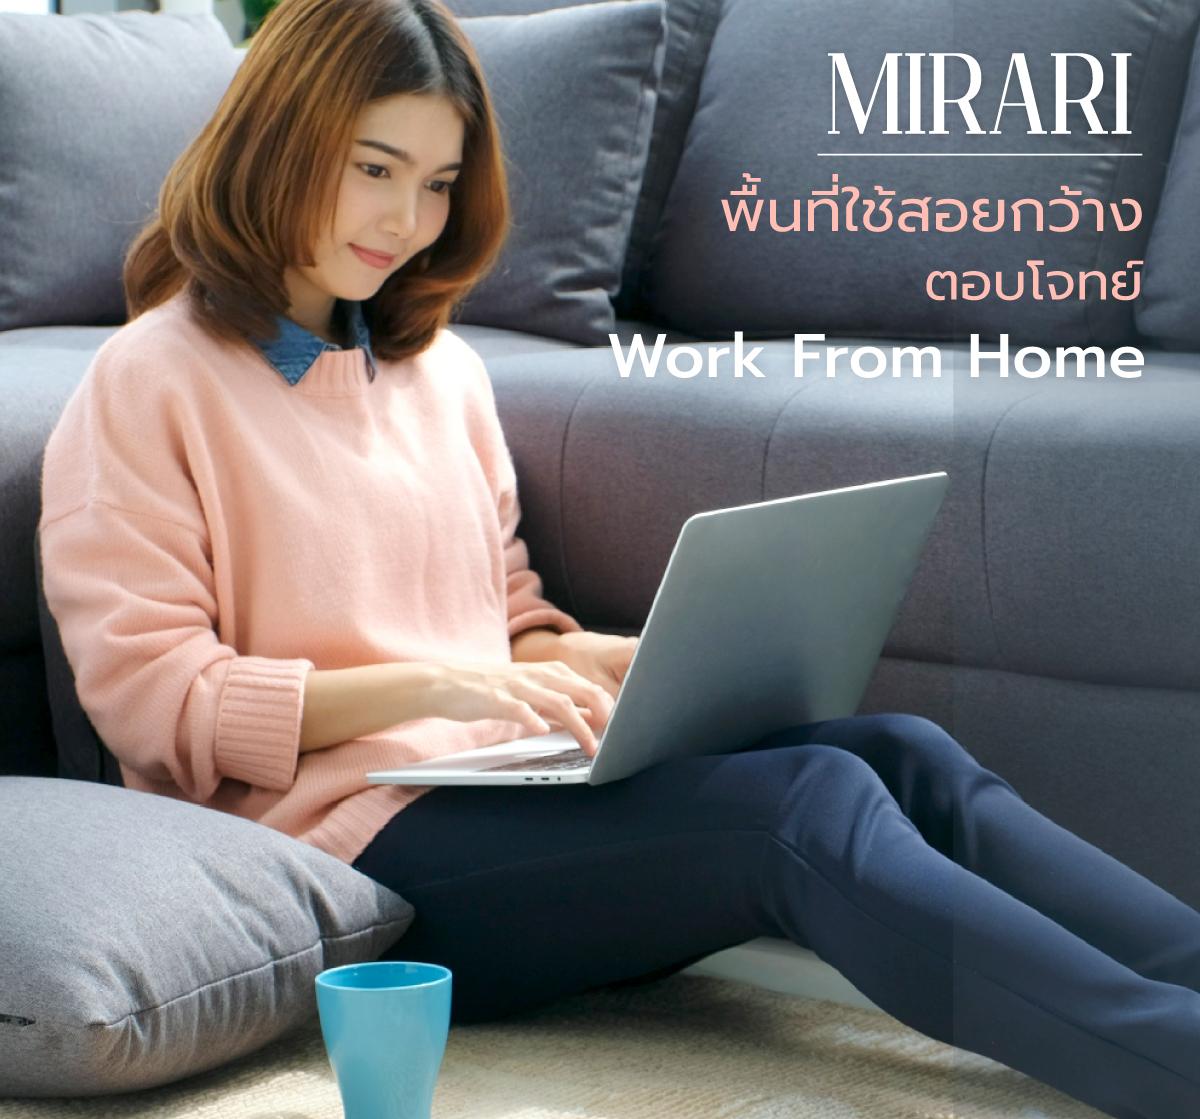 Mirari_mobile_banner02